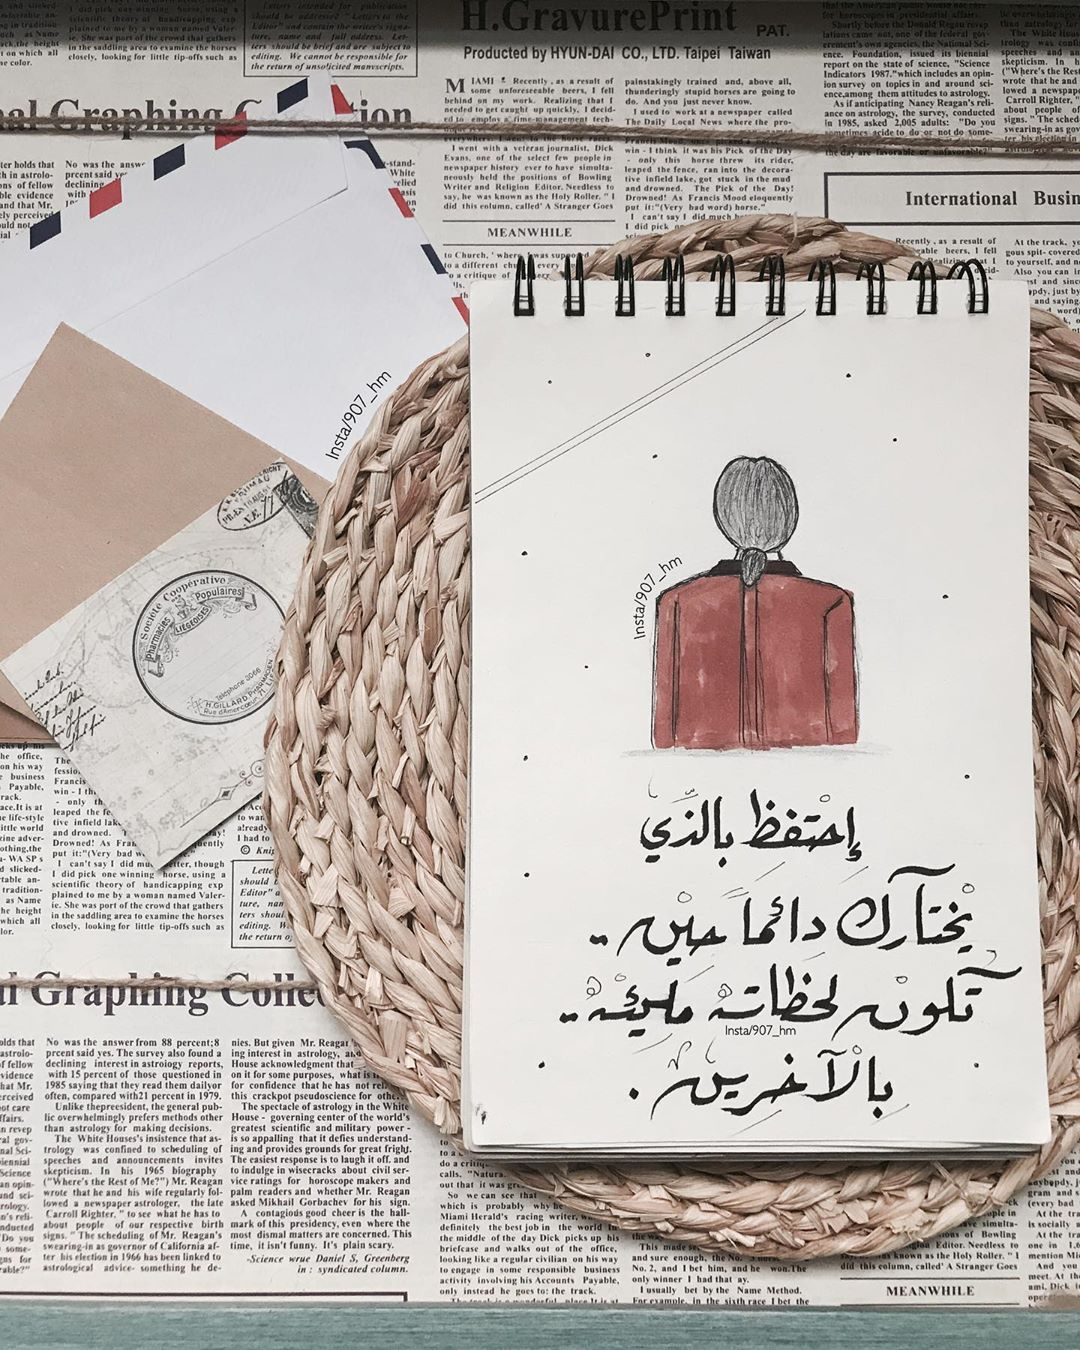 Ha M On Instagram ١٦ سبتمبر احتفظ بالذ ي يختارك دائما حين تكون لحظاته مليئه بالآخرين ز ر ق ـه Wallpaper Quotes Words Quotes Arabic Quotes